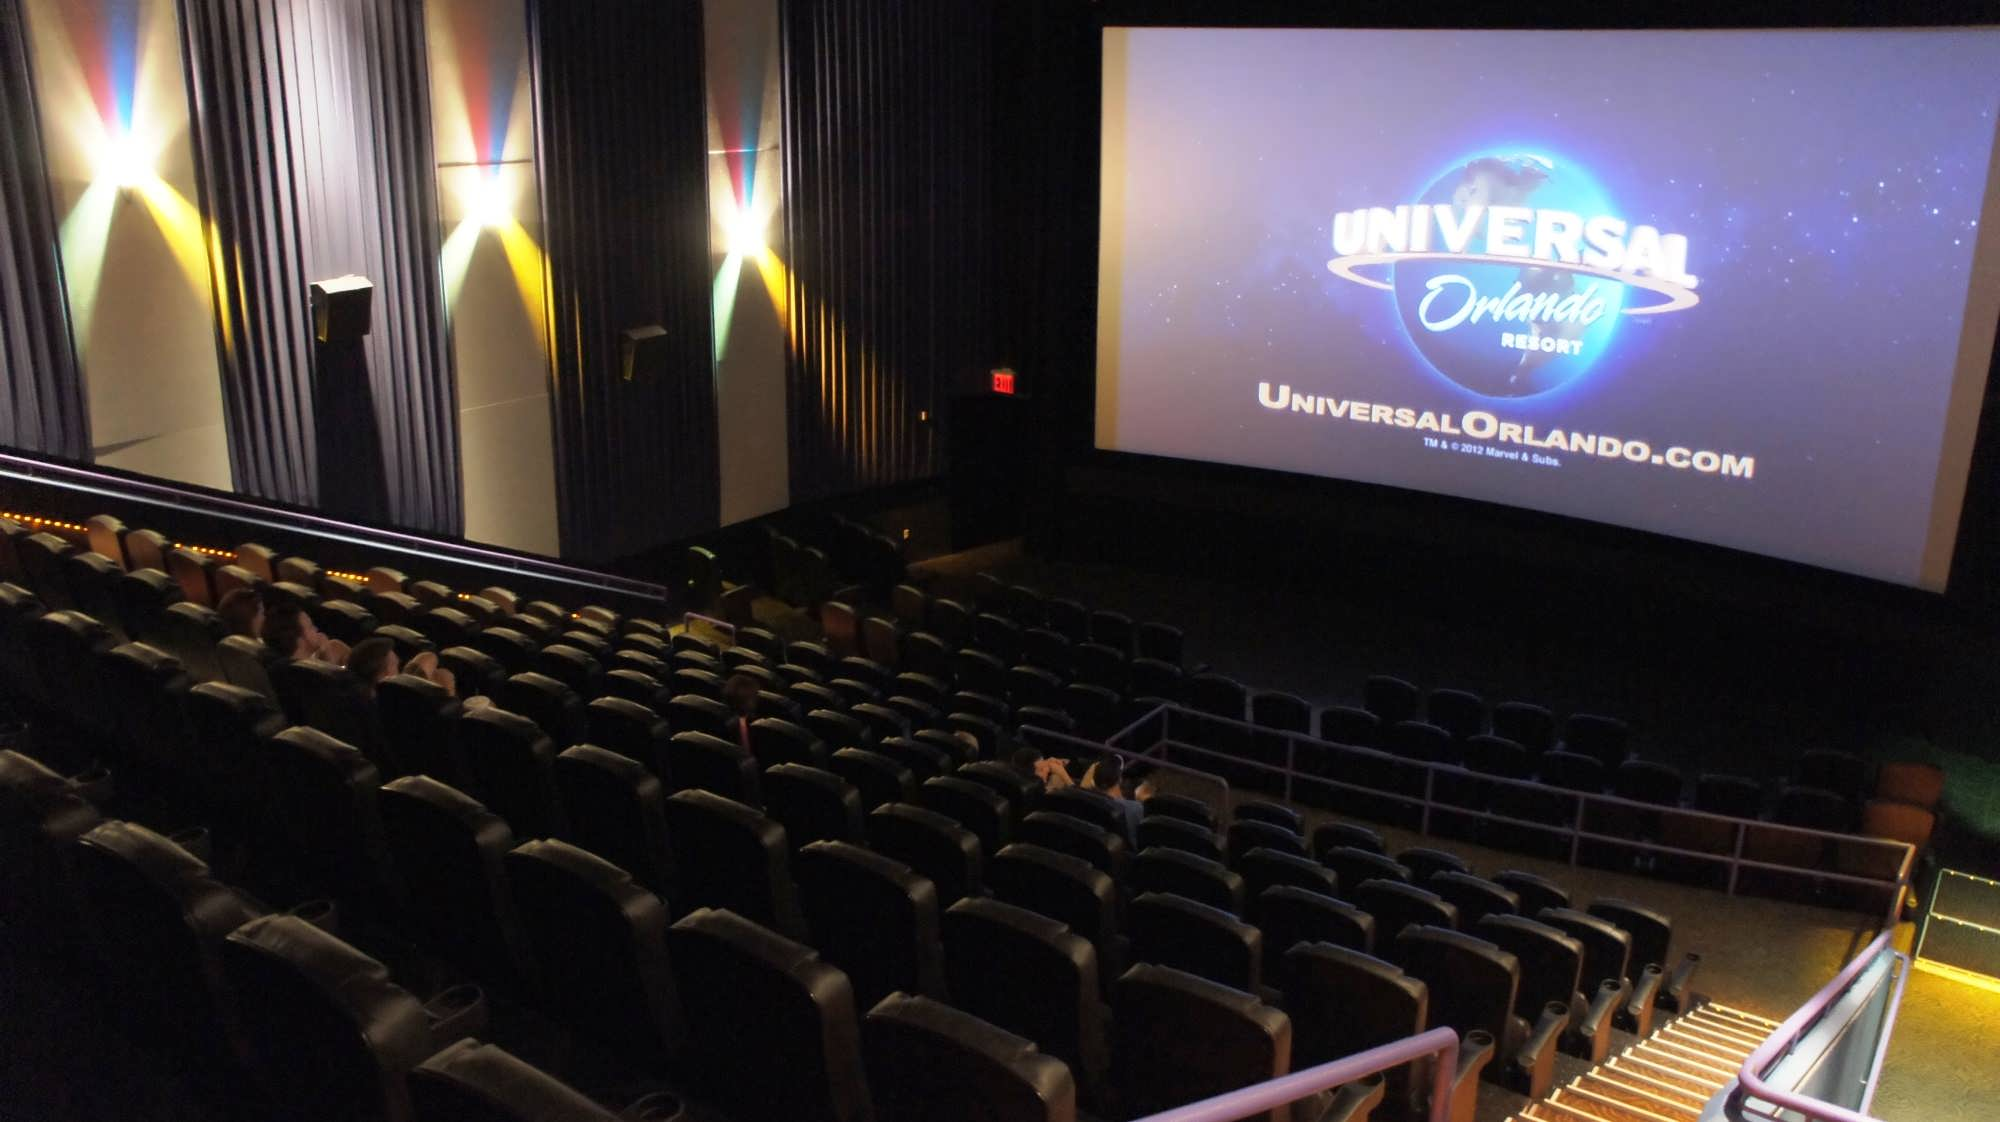 amc universal cineplex imax at universal citywalk orlando amc universal cineplex 20 imax at universal citywalk orlando